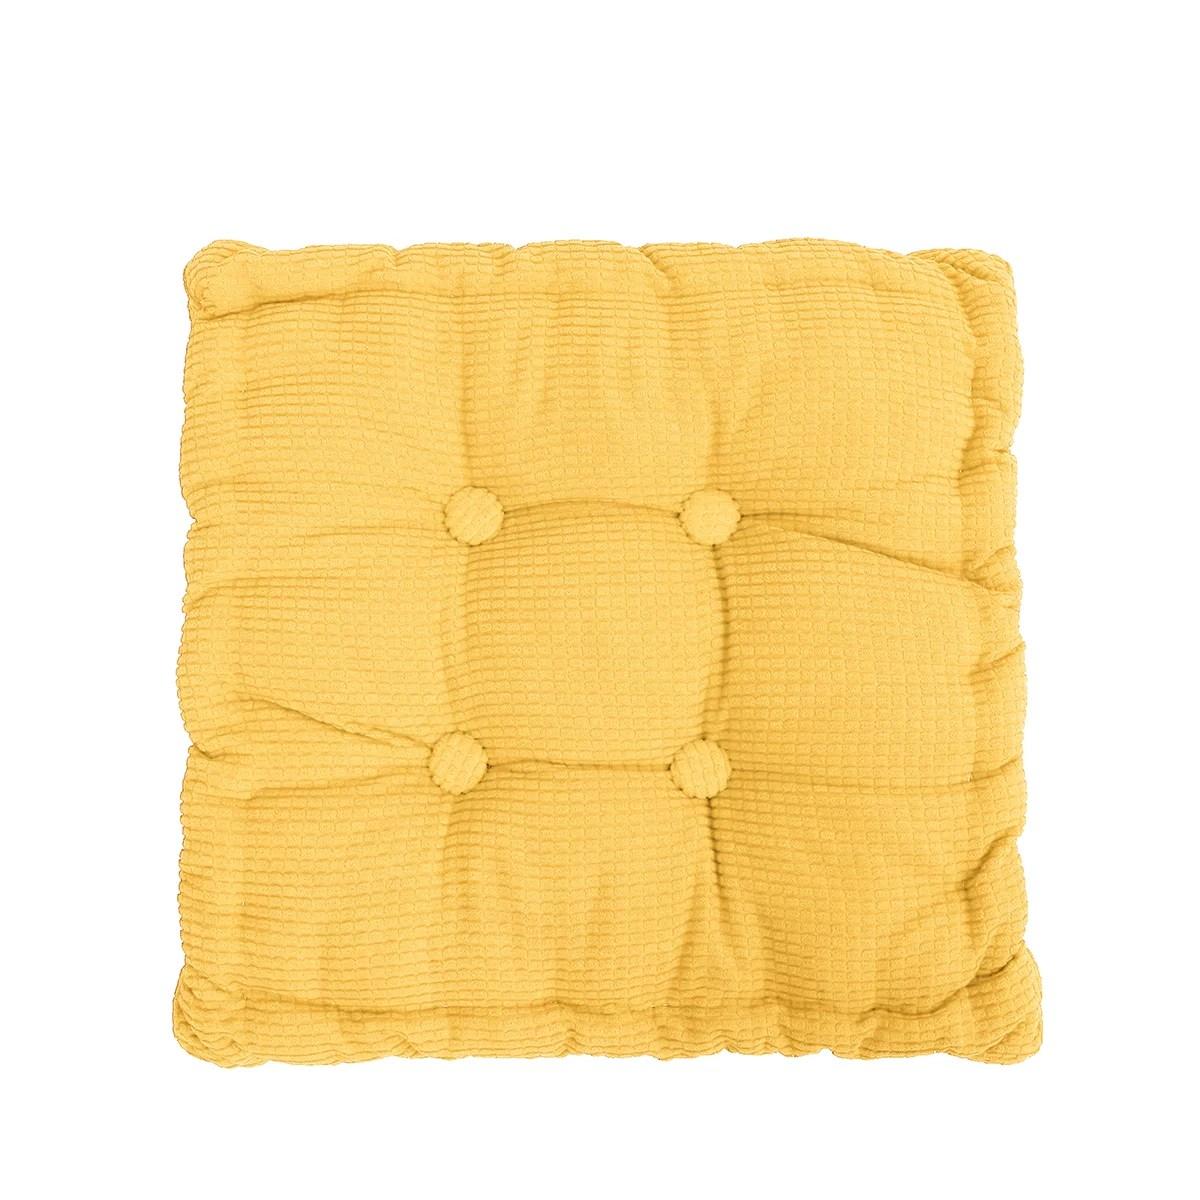 20x20 inch comfortable corduroy tufted cushion solid soft thicken corduroy chair cushion seat pad tatami floor cushion for living room balcony garden